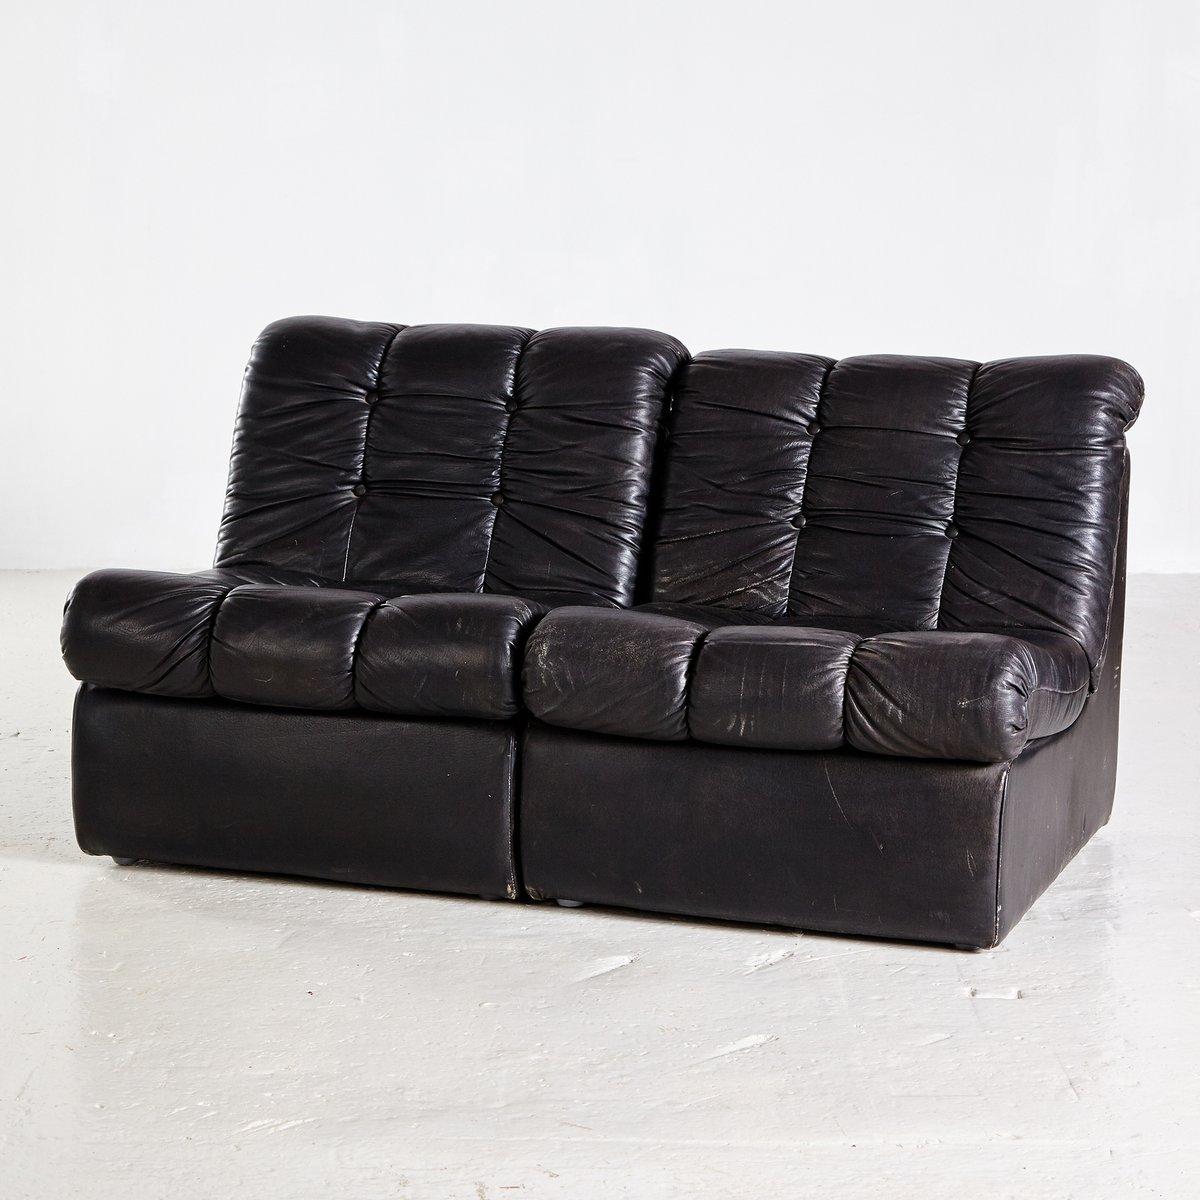 Vintage Black Leather Modular Sofa, 1970s For Sale At Pamono